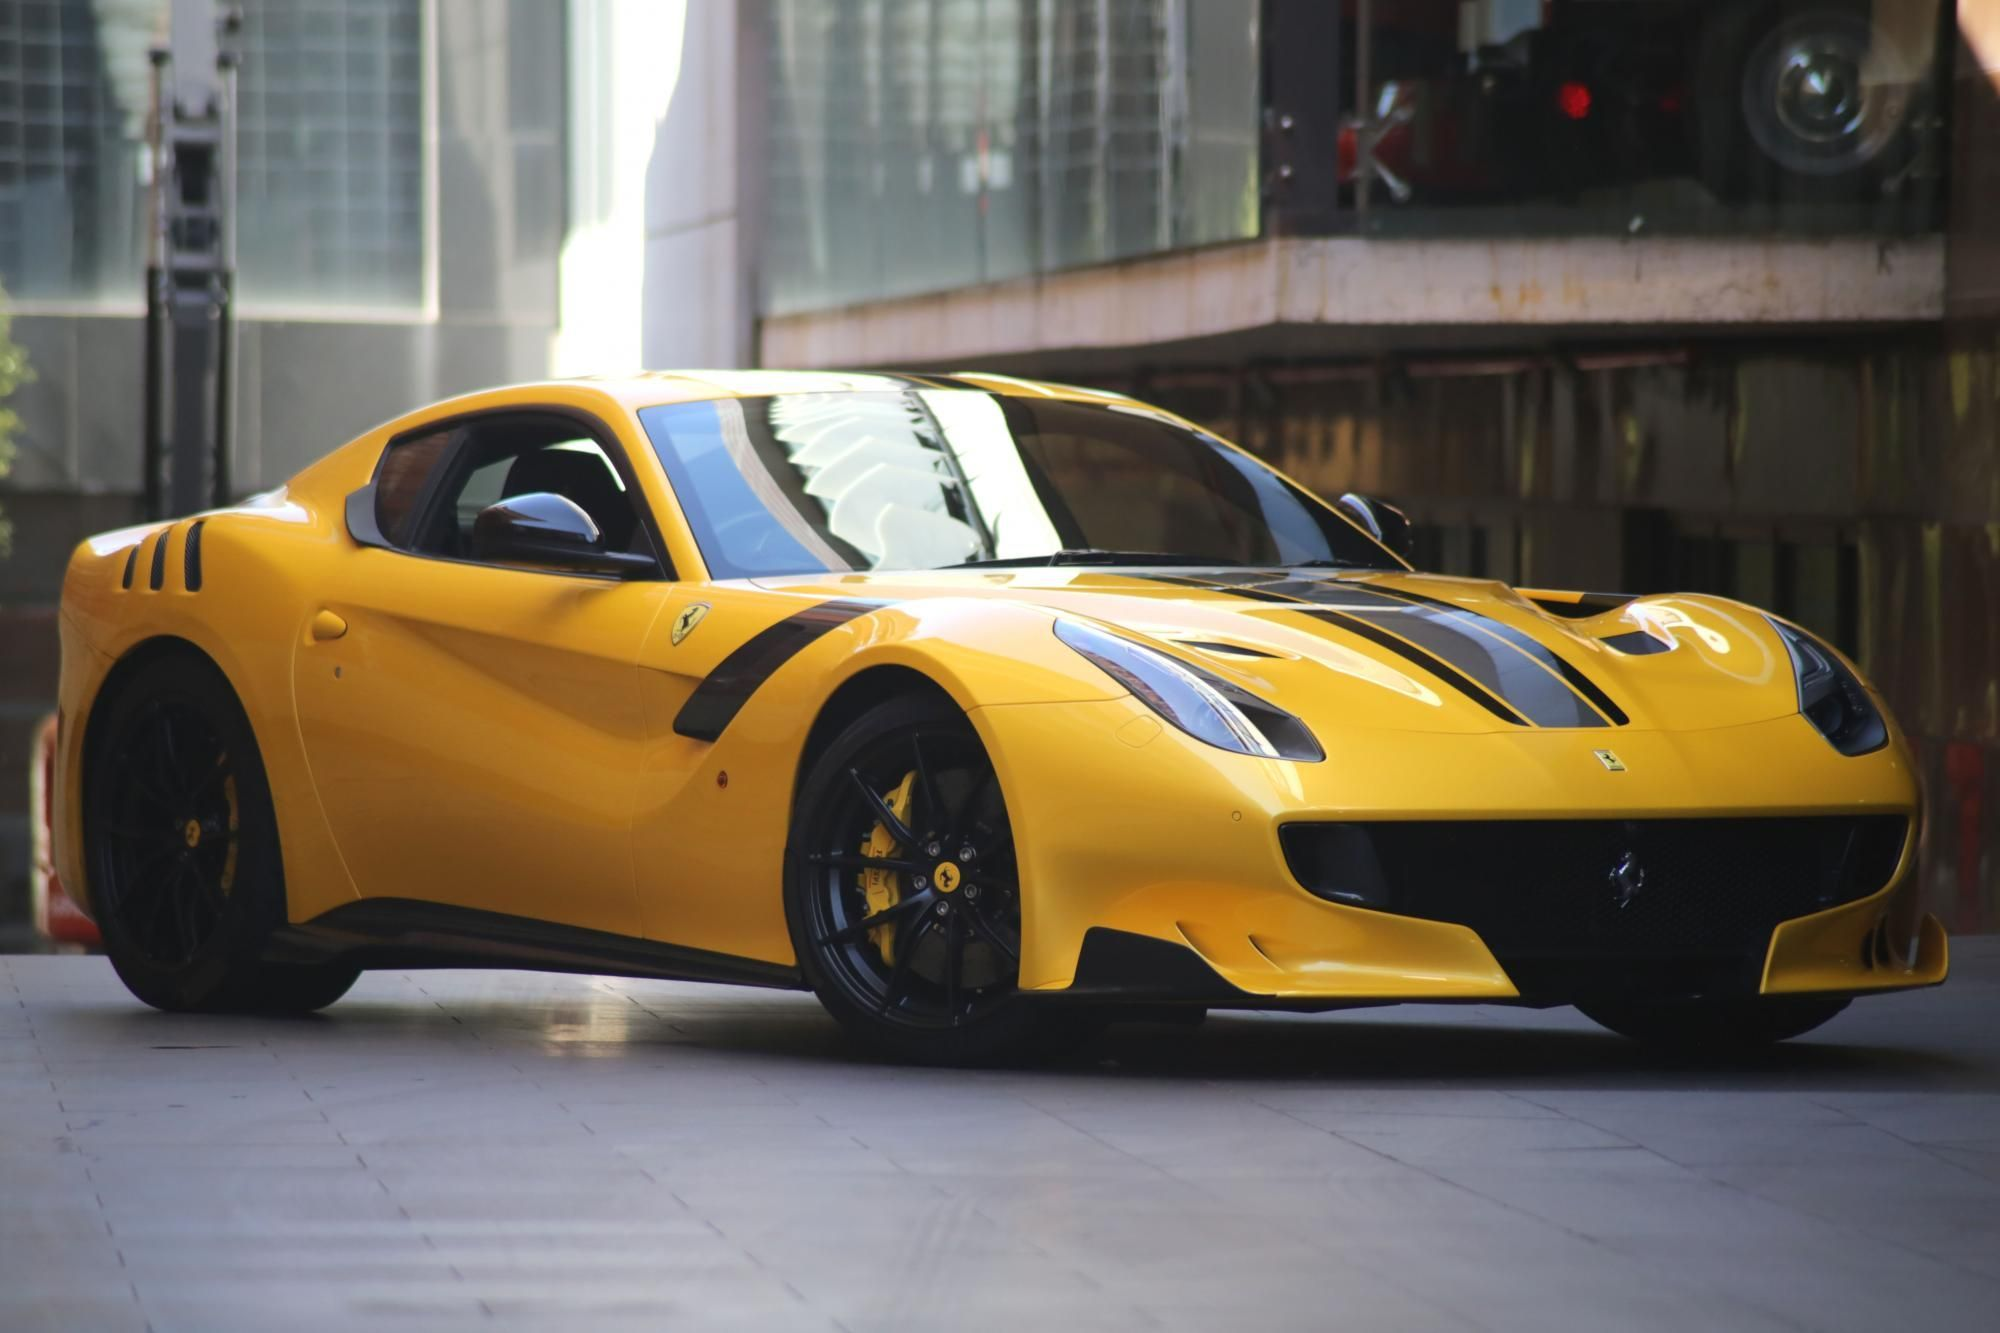 2016 Ferrari F12tdf F152 Coupe 2dr Dct 7sp 6 3i May